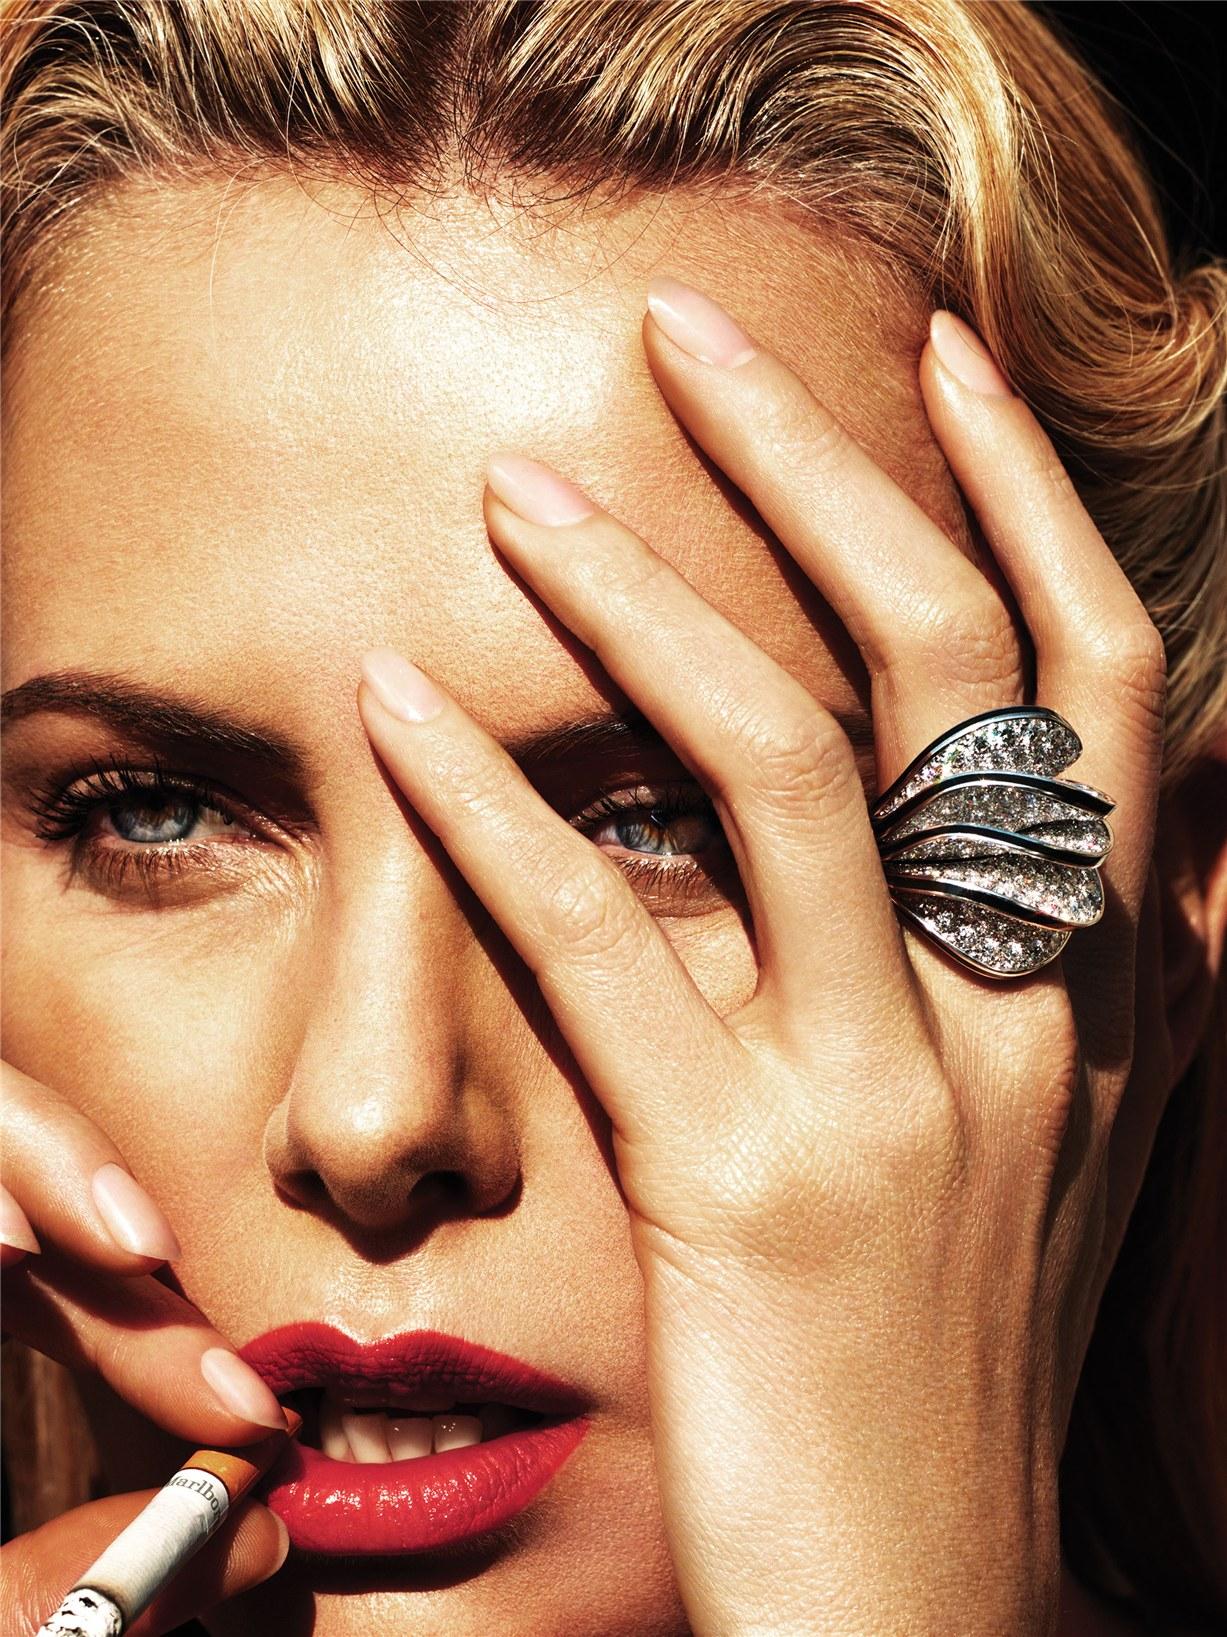 Звезда нового -Безумного Макса- Шарлиз Терон / Charlize Theron by Mert Alas and Marcus Piggott in W Magazine may 2015